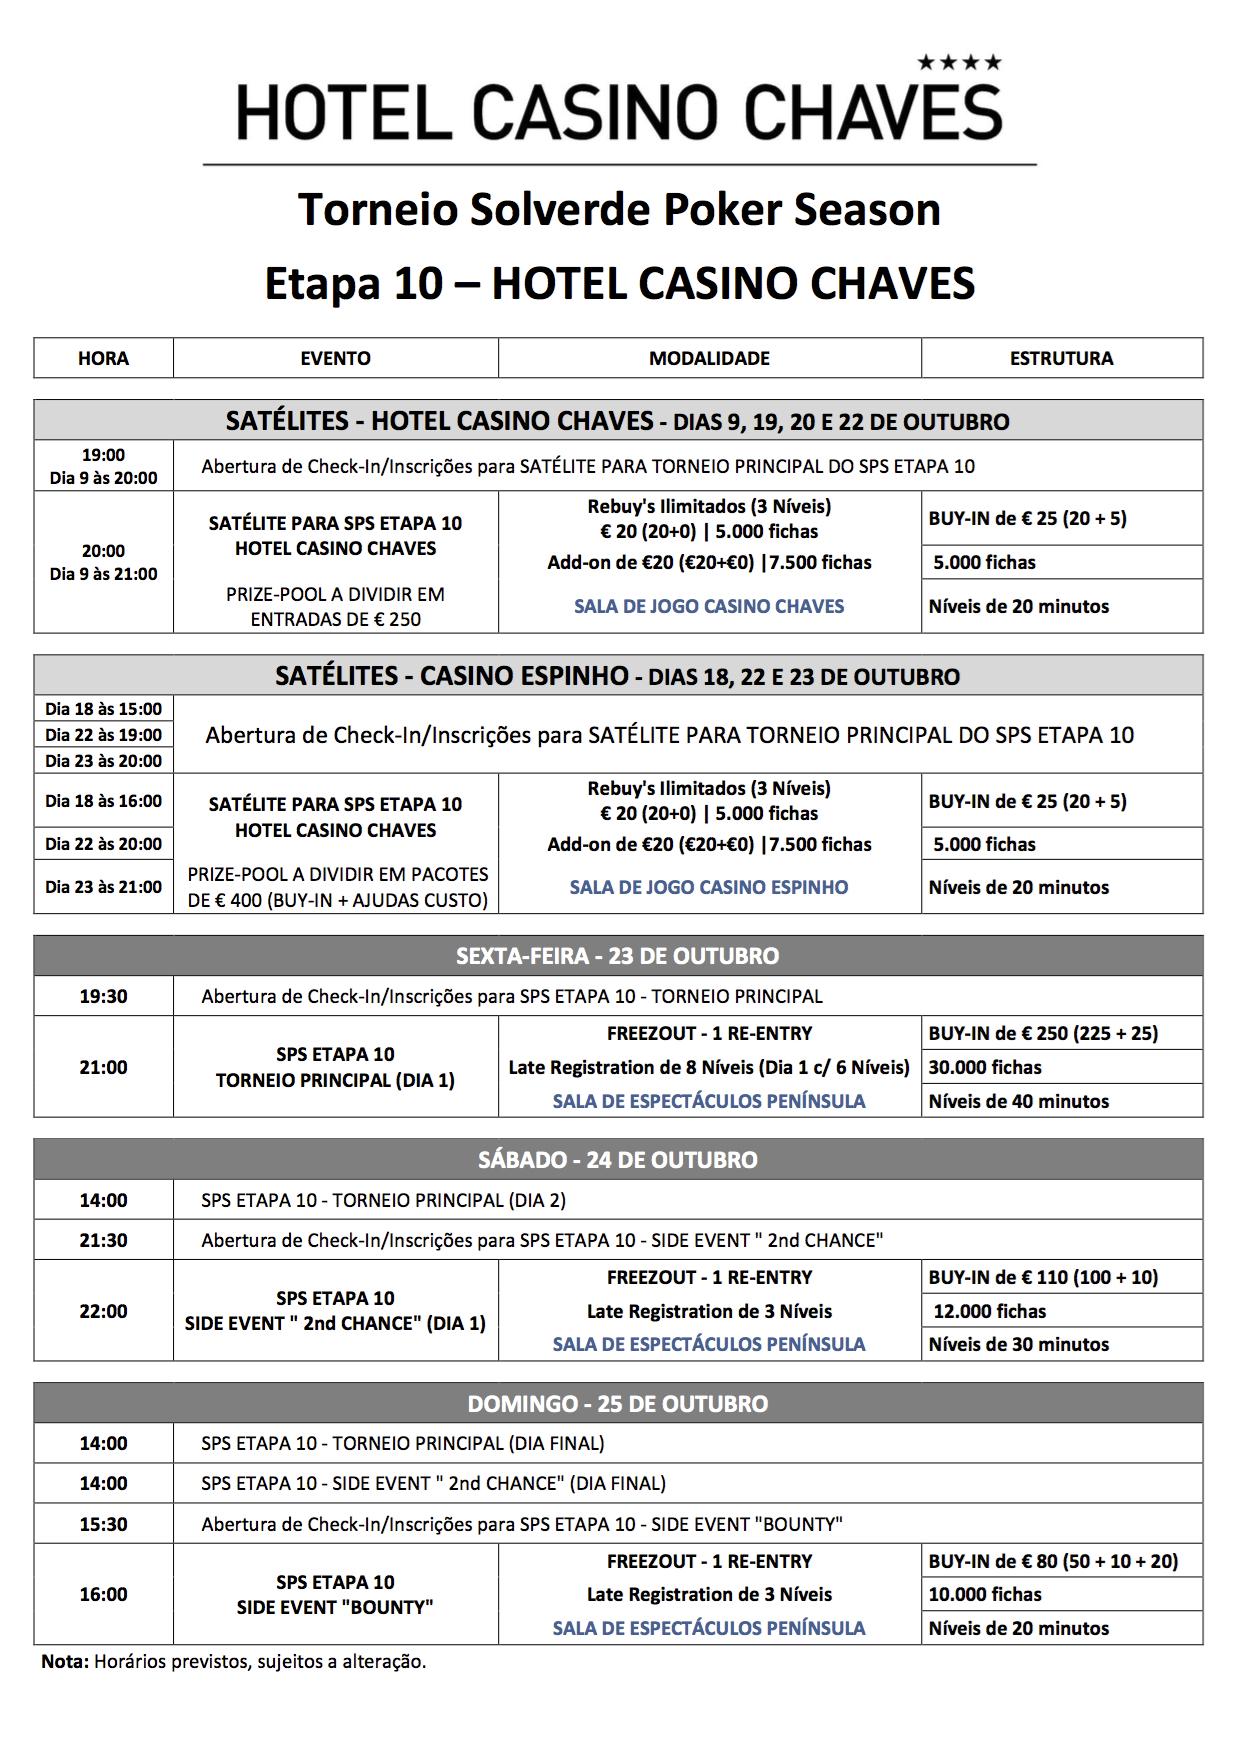 Programa, Satélites e Packs Etapa 10 Solverde Poker Season (23 a 25 Outubro em Chaves) 101